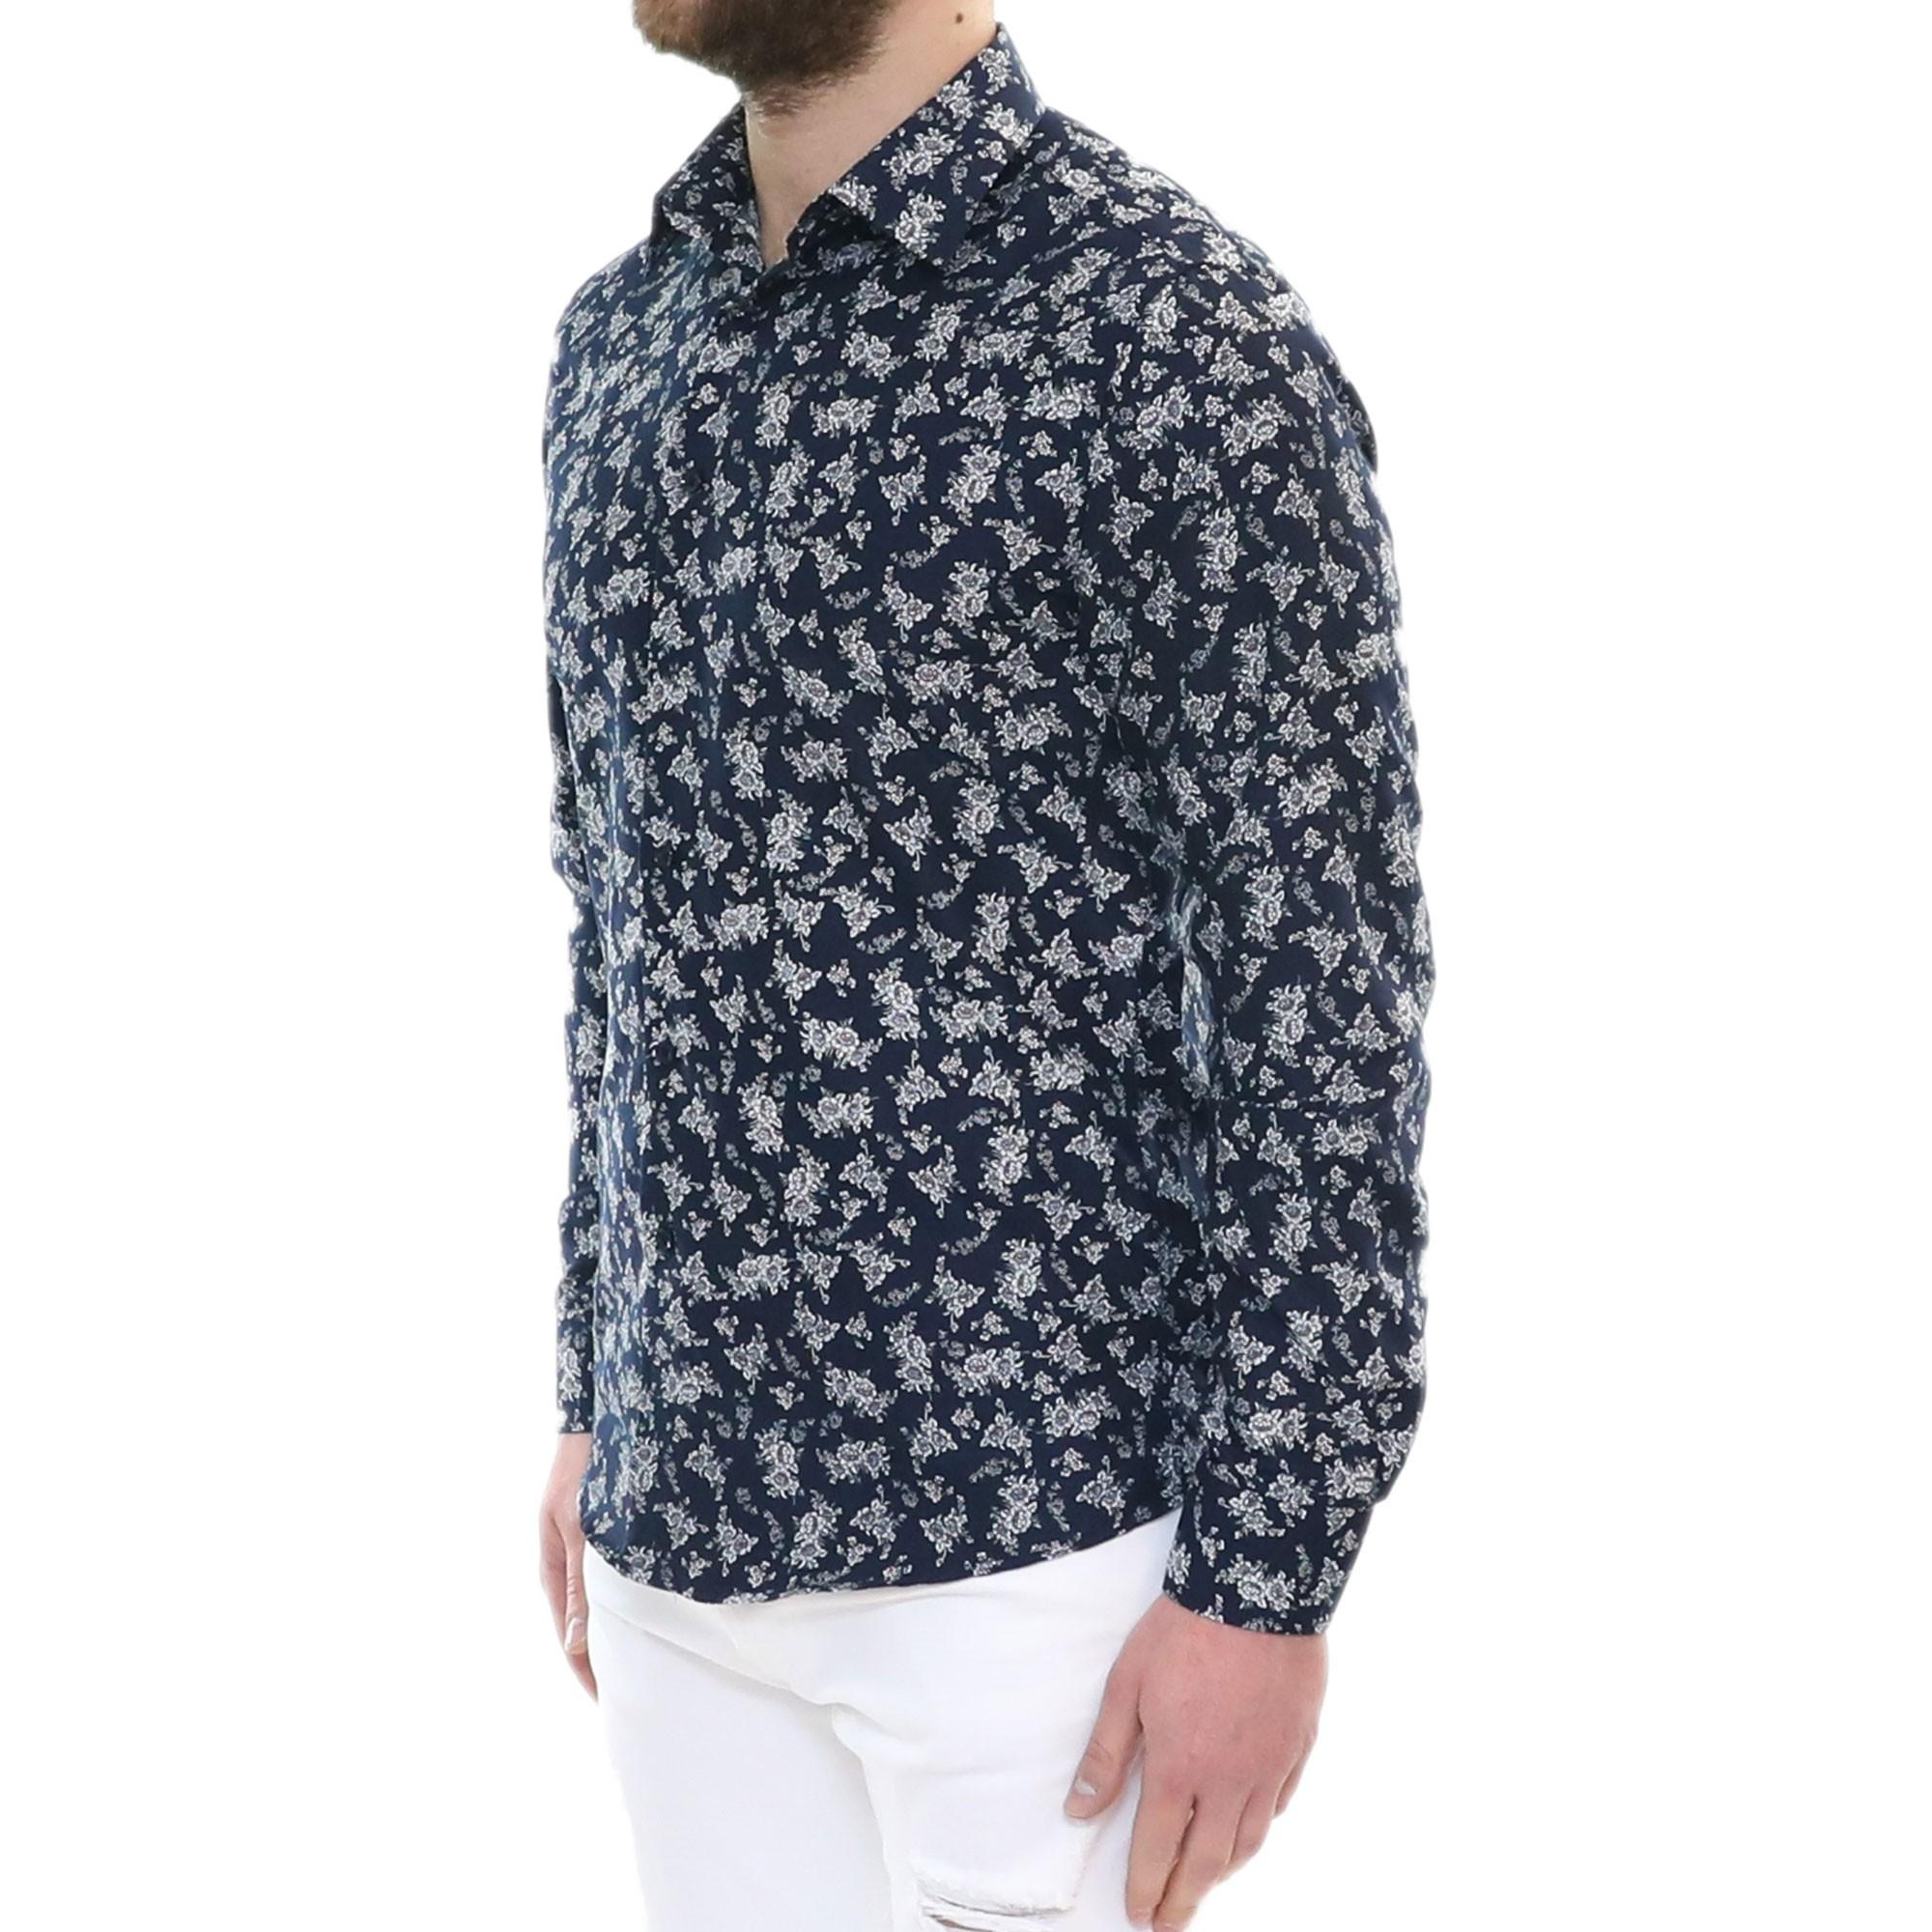 Camicia-Uomo-Cotone-Fiori-Slim-Manica-Lunga-Fantasia-Floreale-S-M-L-XL-XXL miniatura 11